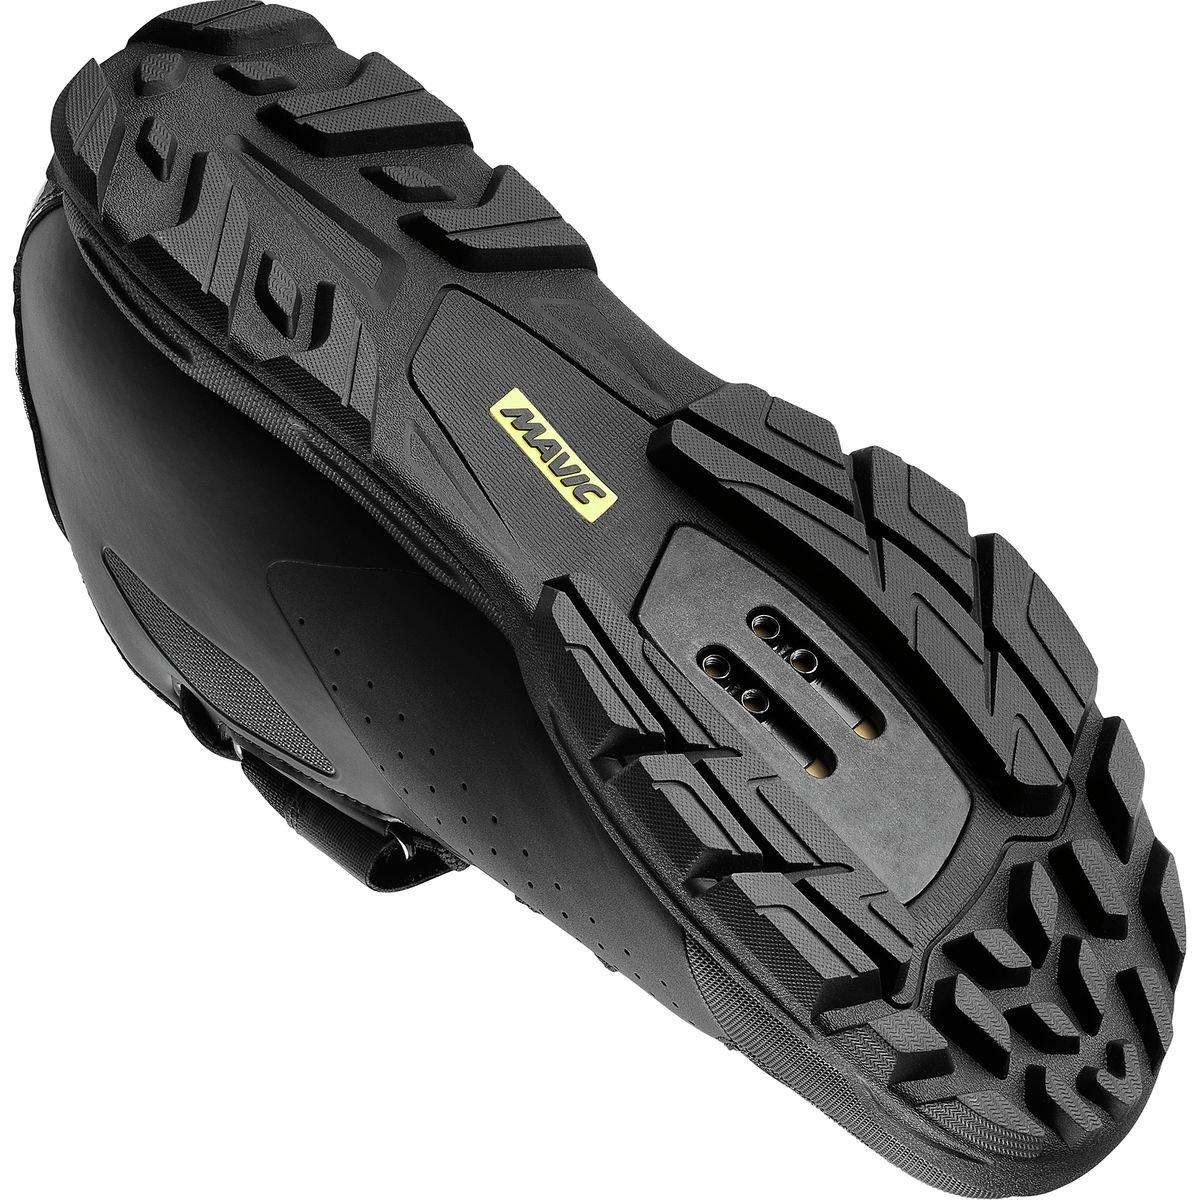 Mavic Deemax Pro MTB Fahrrad Fahrrad Fahrrad Schuhe schwarz 2019  Größe  40 fd969c